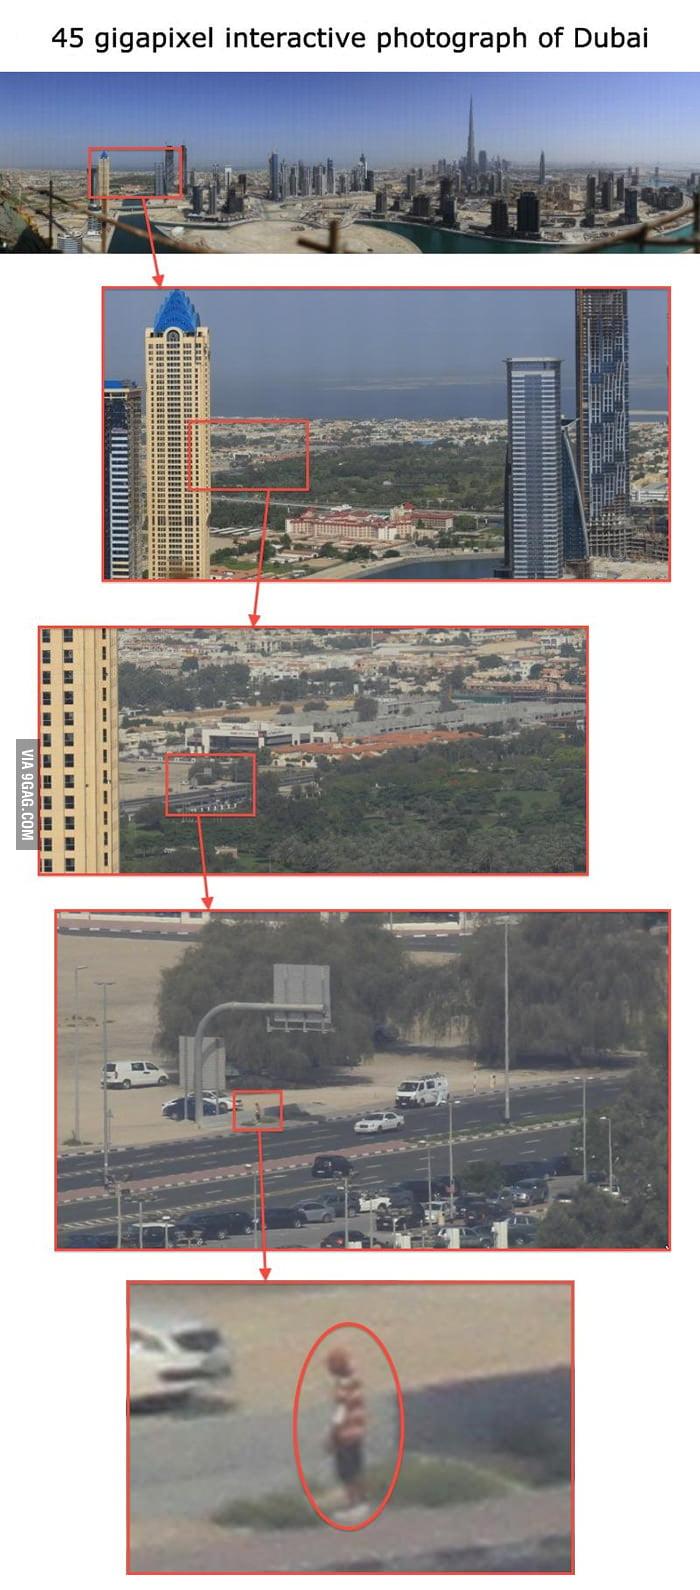 45 gigapixel interactive photograph of Dubai.